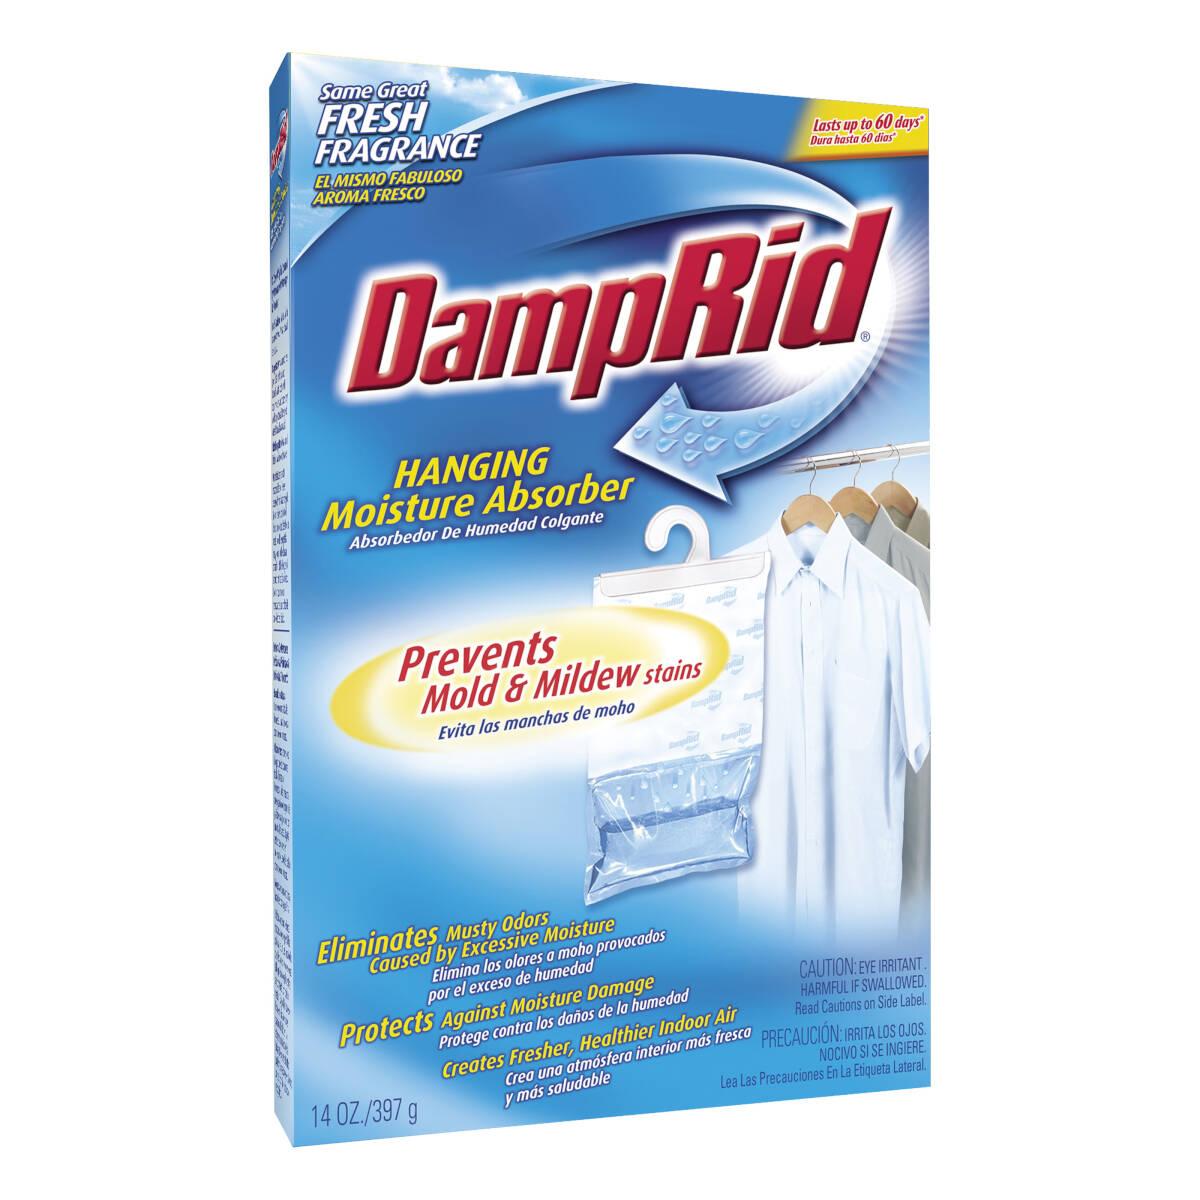 DampRid FG80